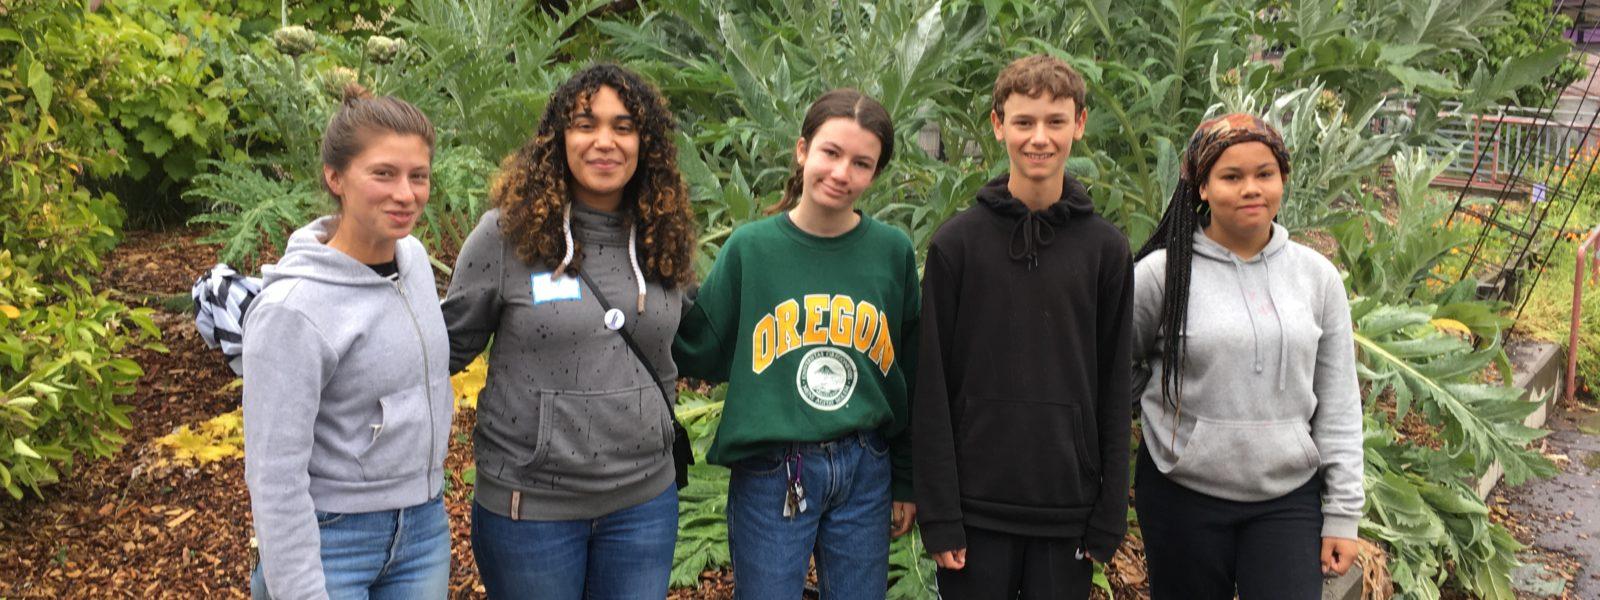 Award-winning Poet and Novelist Elizabeth Acevedo Makes Berkeley School Visits